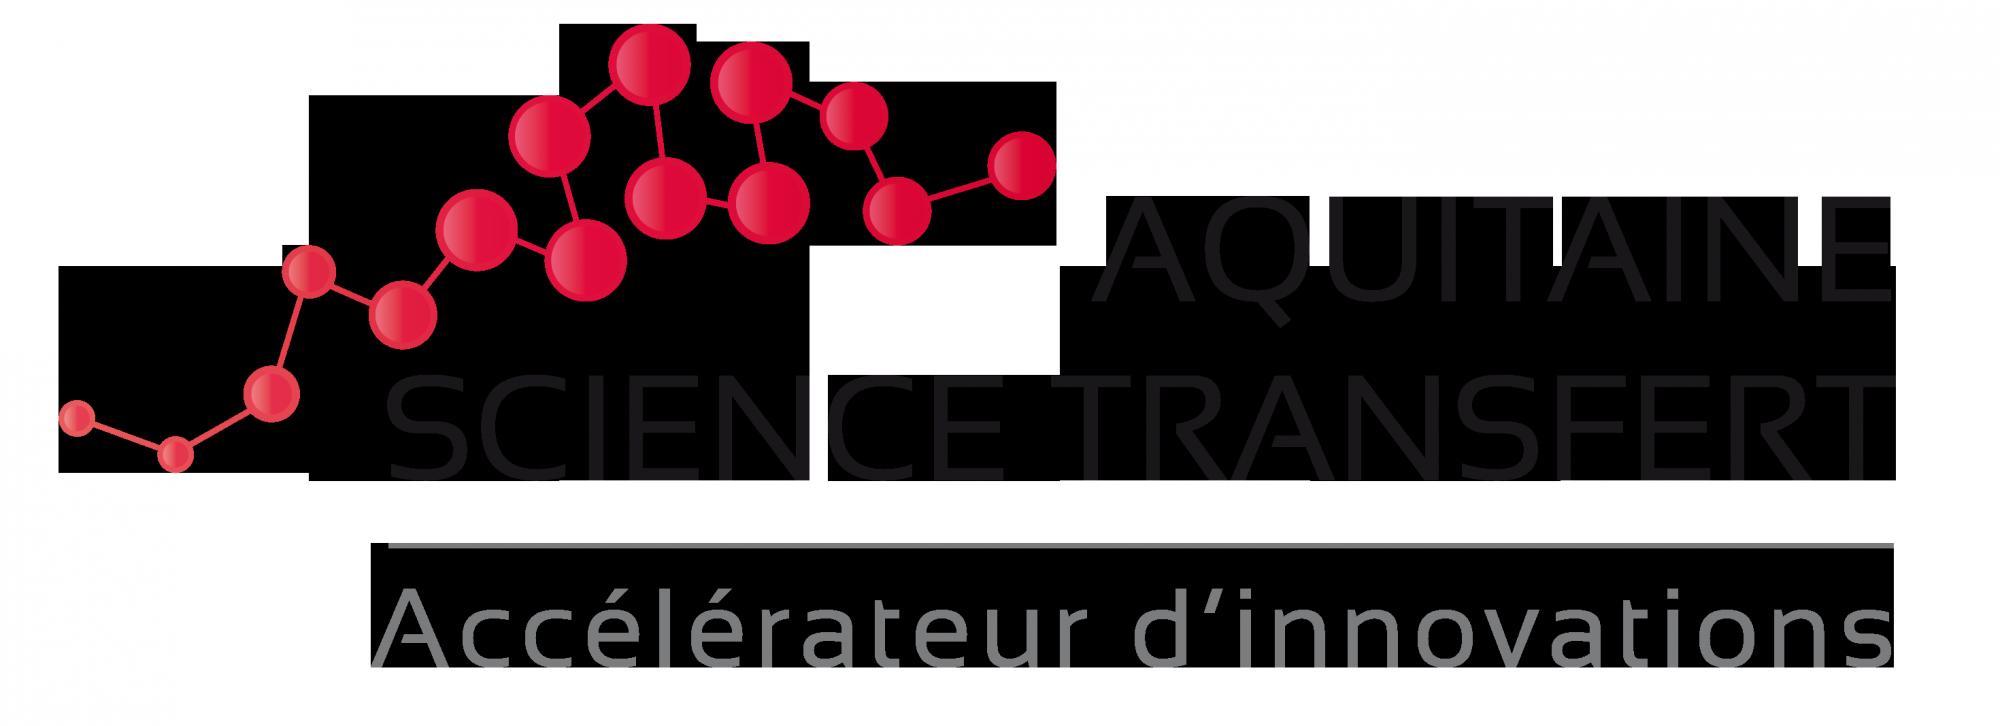 Logo Aquitaine Science Transfert, Accélérateur d'innovations